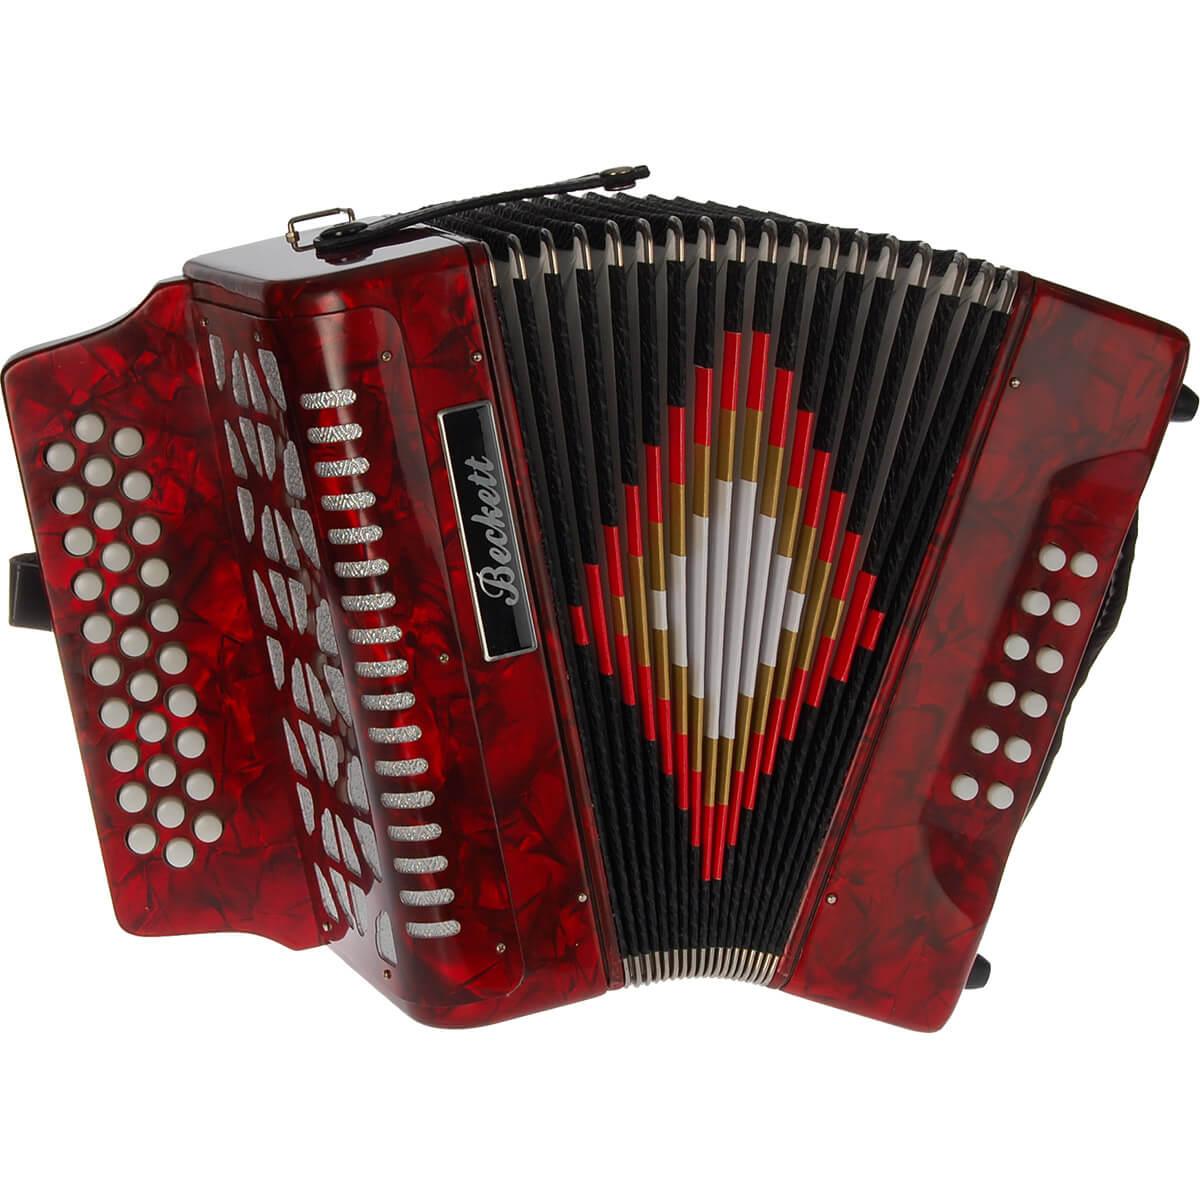 Knap-harmonika